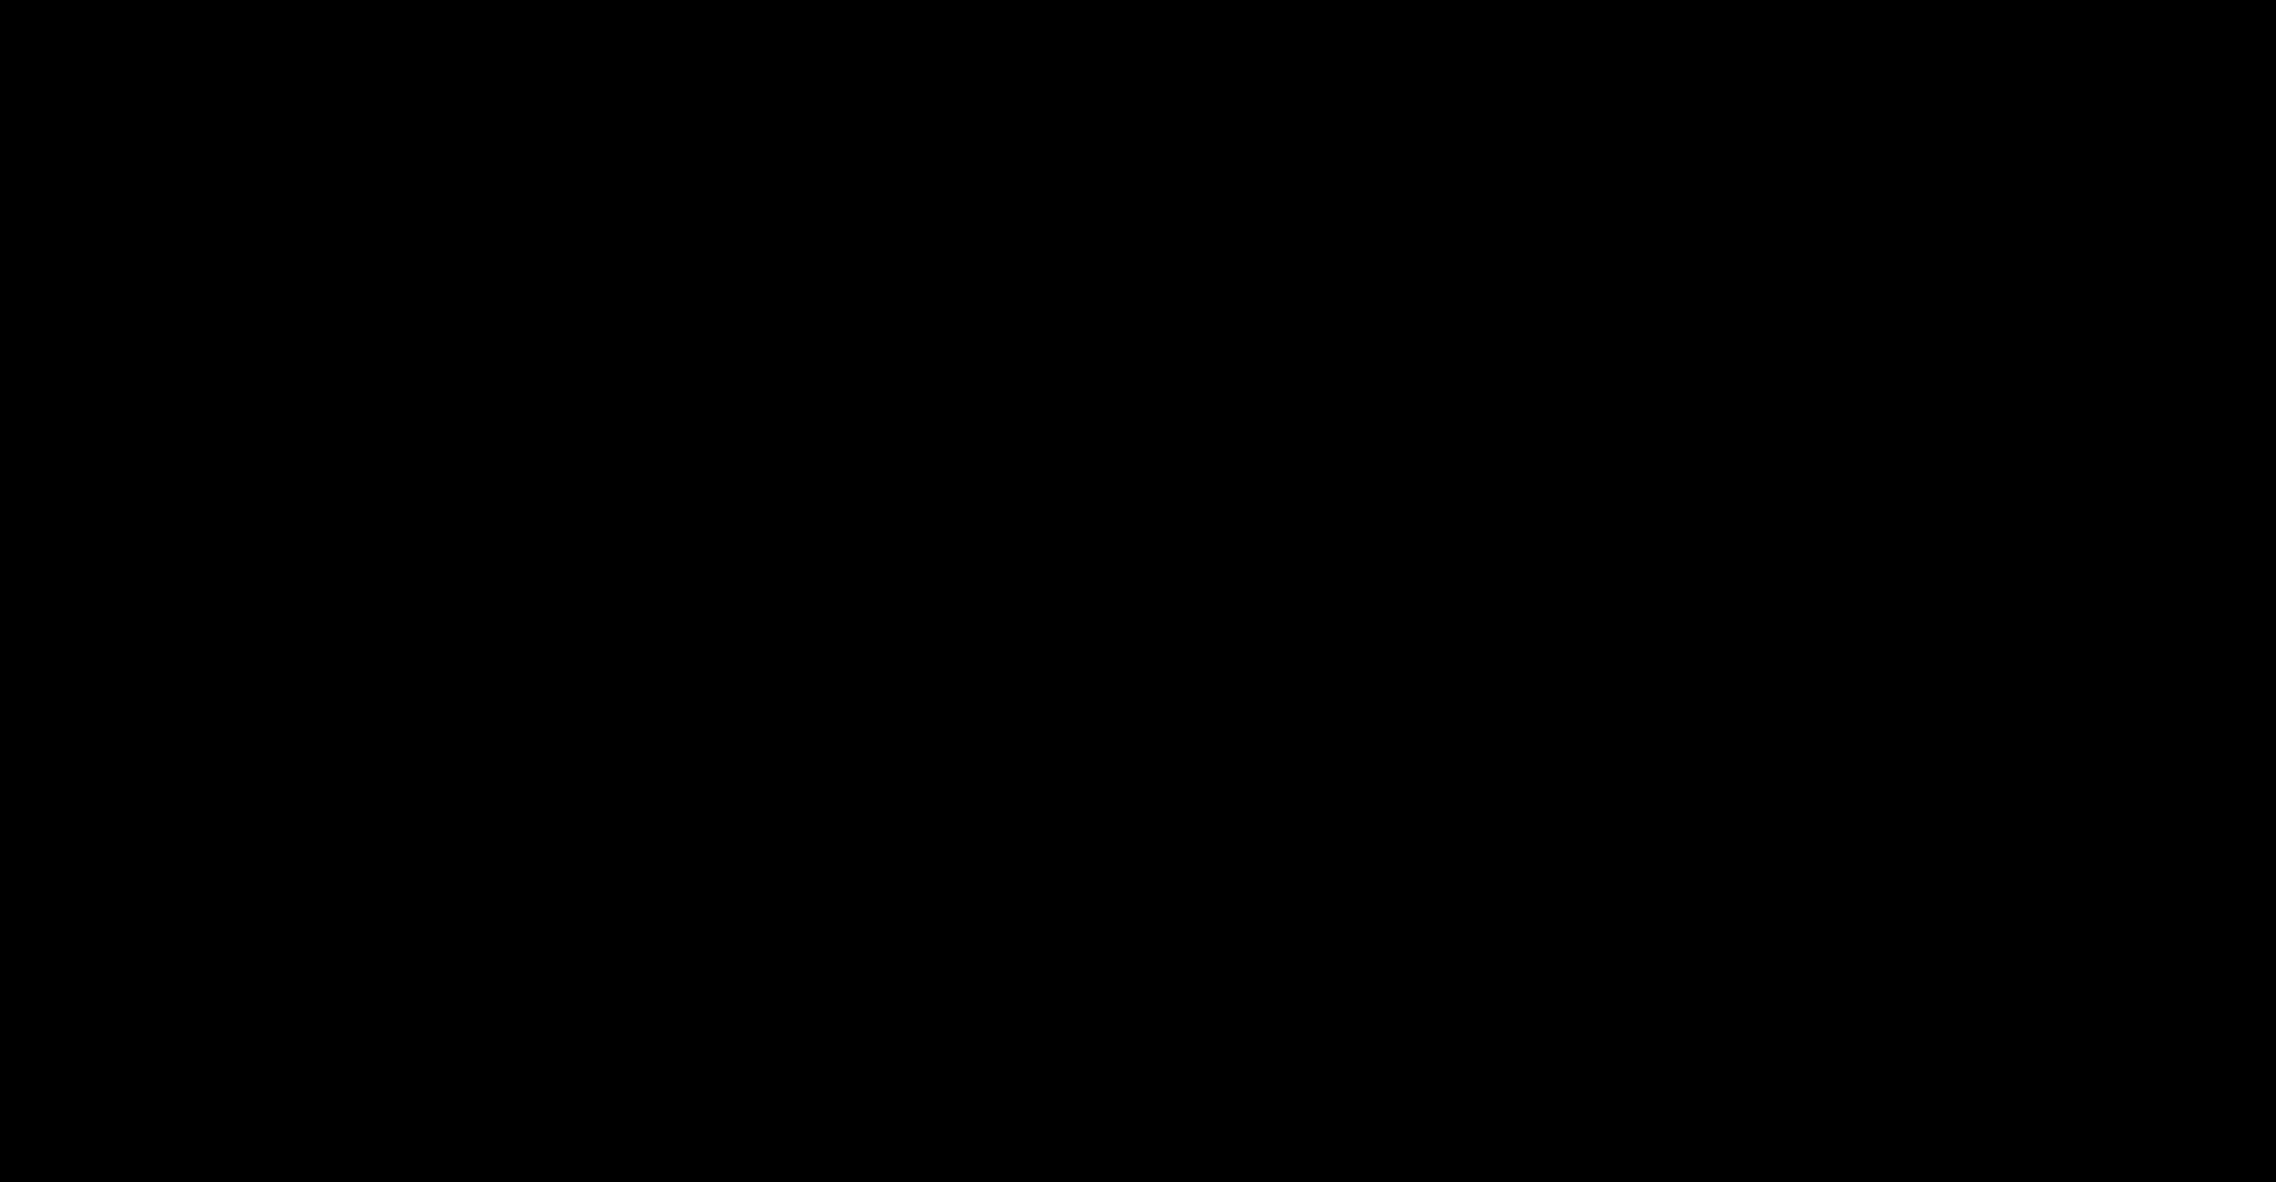 2276x1182 Clipart